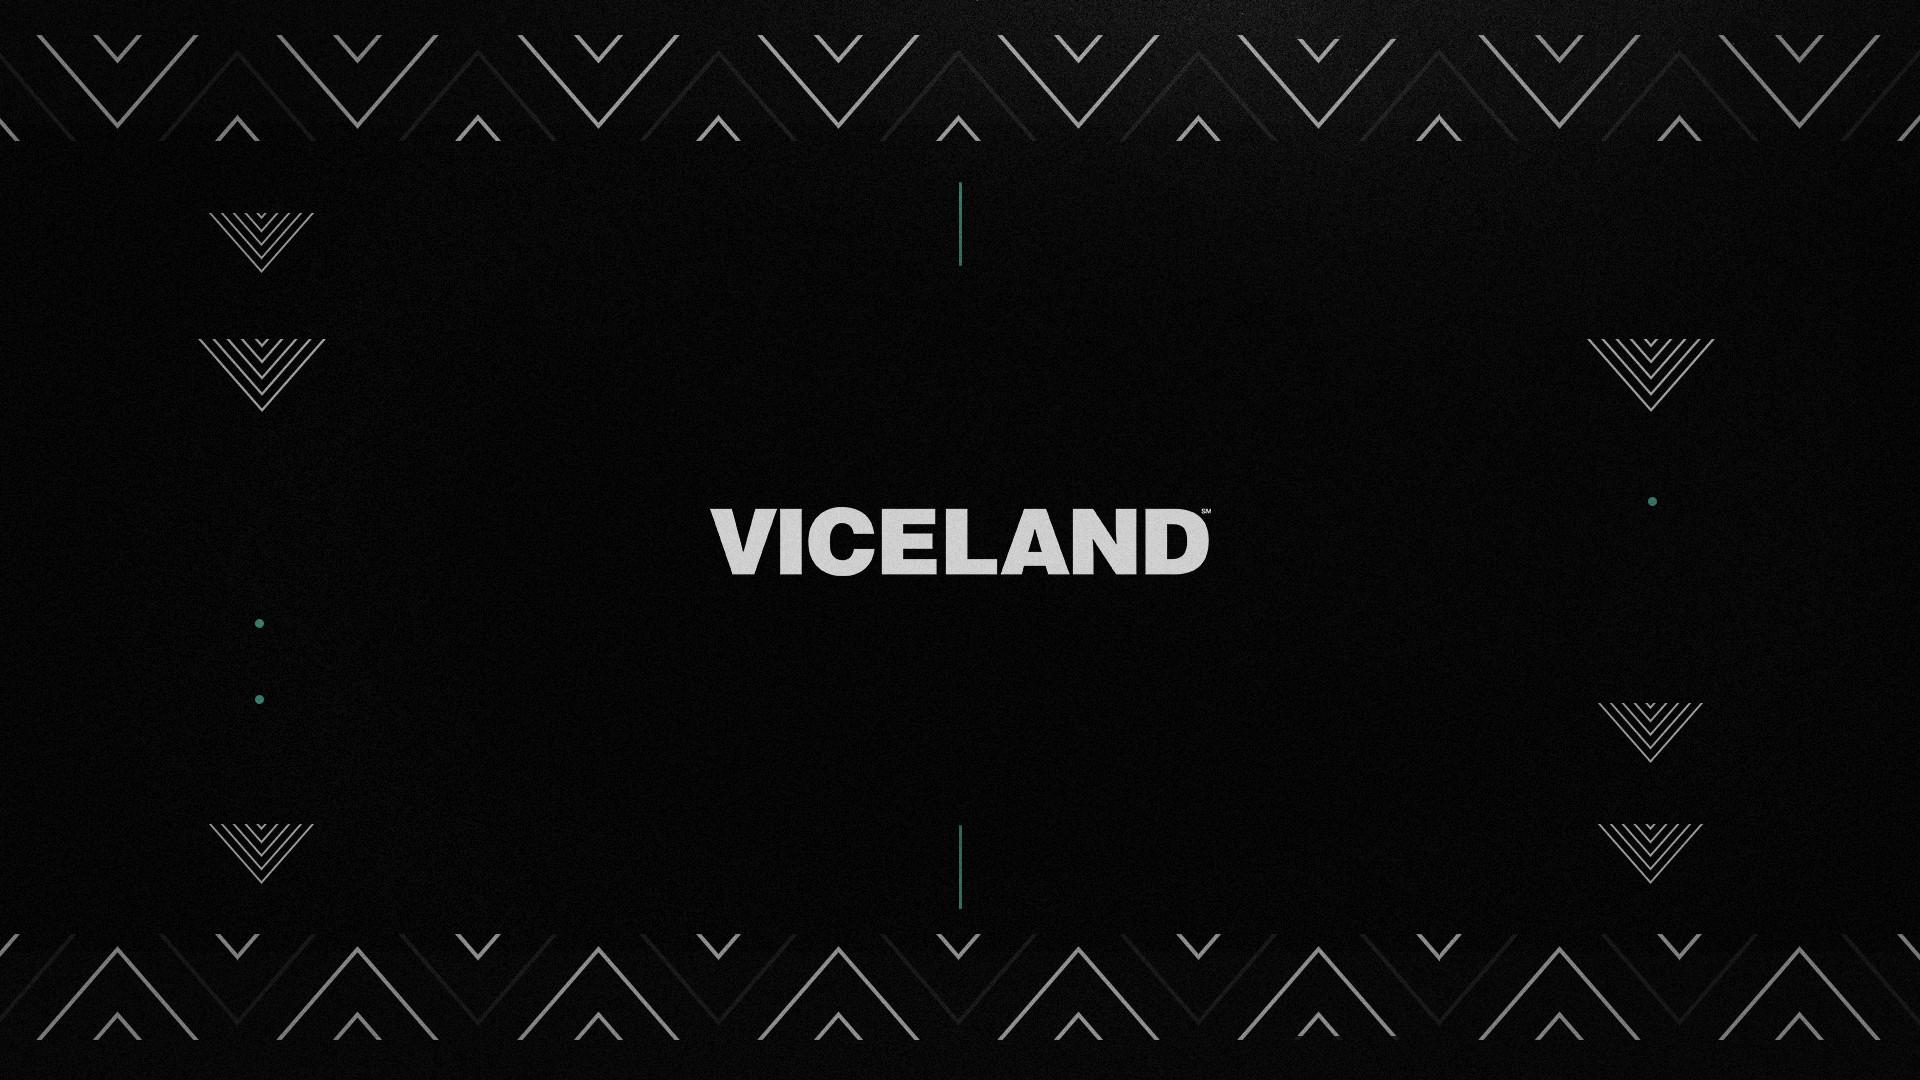 A+E_Upfront_ViceLand_02_transition.jpg